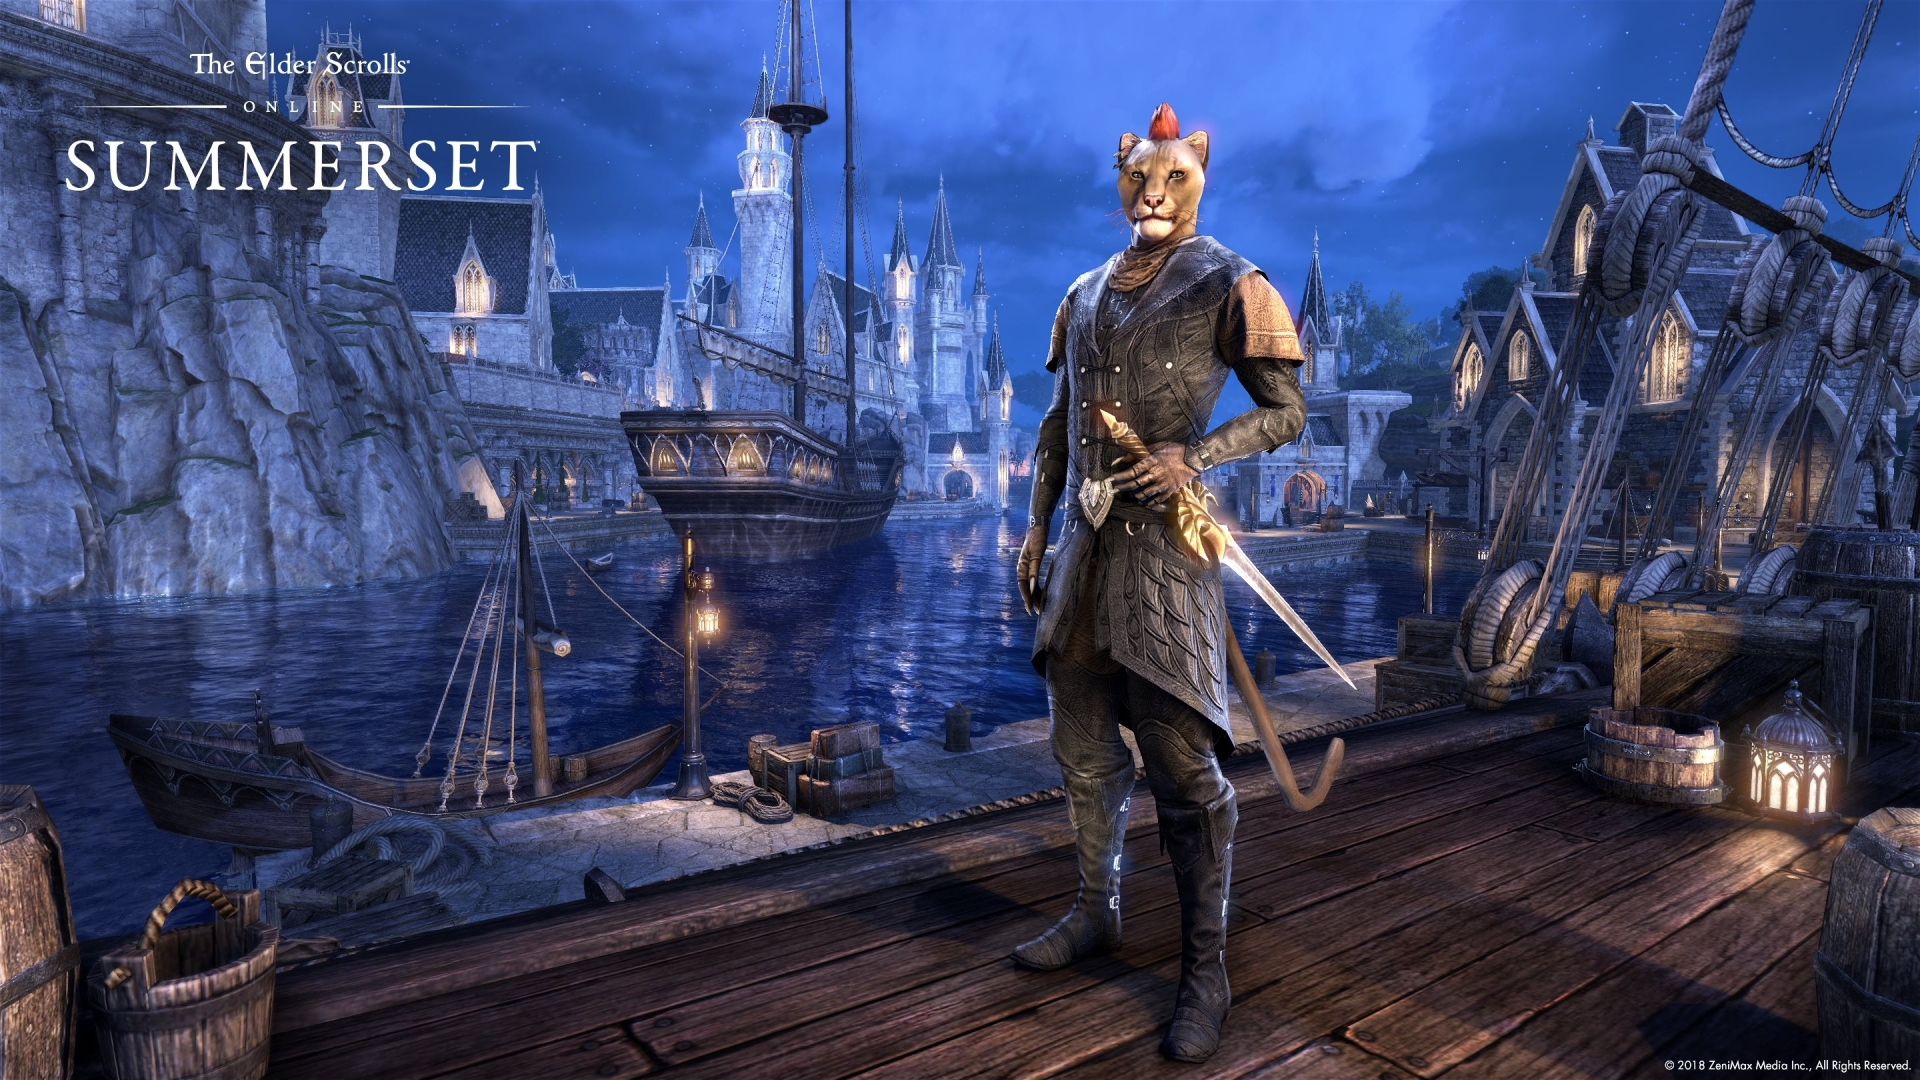 Summerset The Elder Scrolls Online Tamriel Unlimited Xbox One PS4 PC Review Test Kritik Razum-Dar